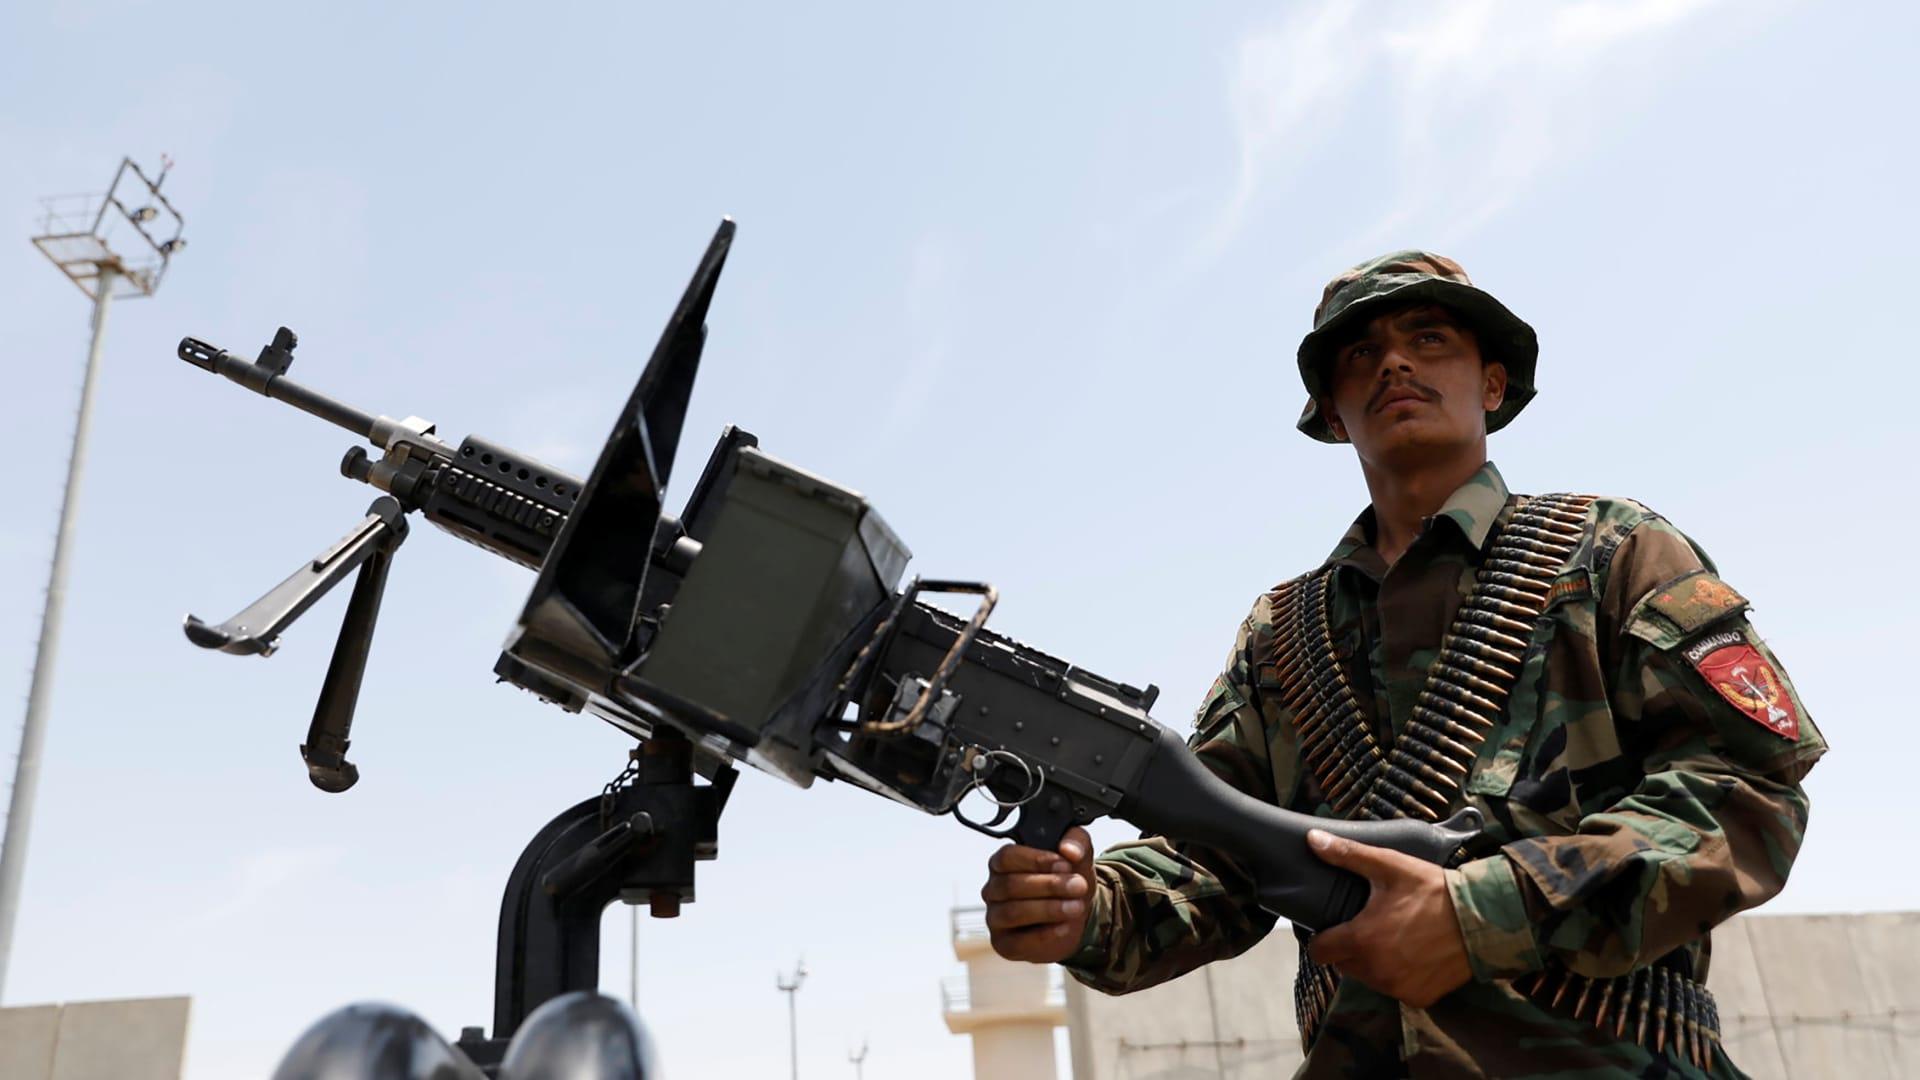 An Afghan security forces member keeps watch in an army vehicle in Bagram U.S. air base, after American troops vacated it, in Parwan province, Afghanistan July 5, 2021.